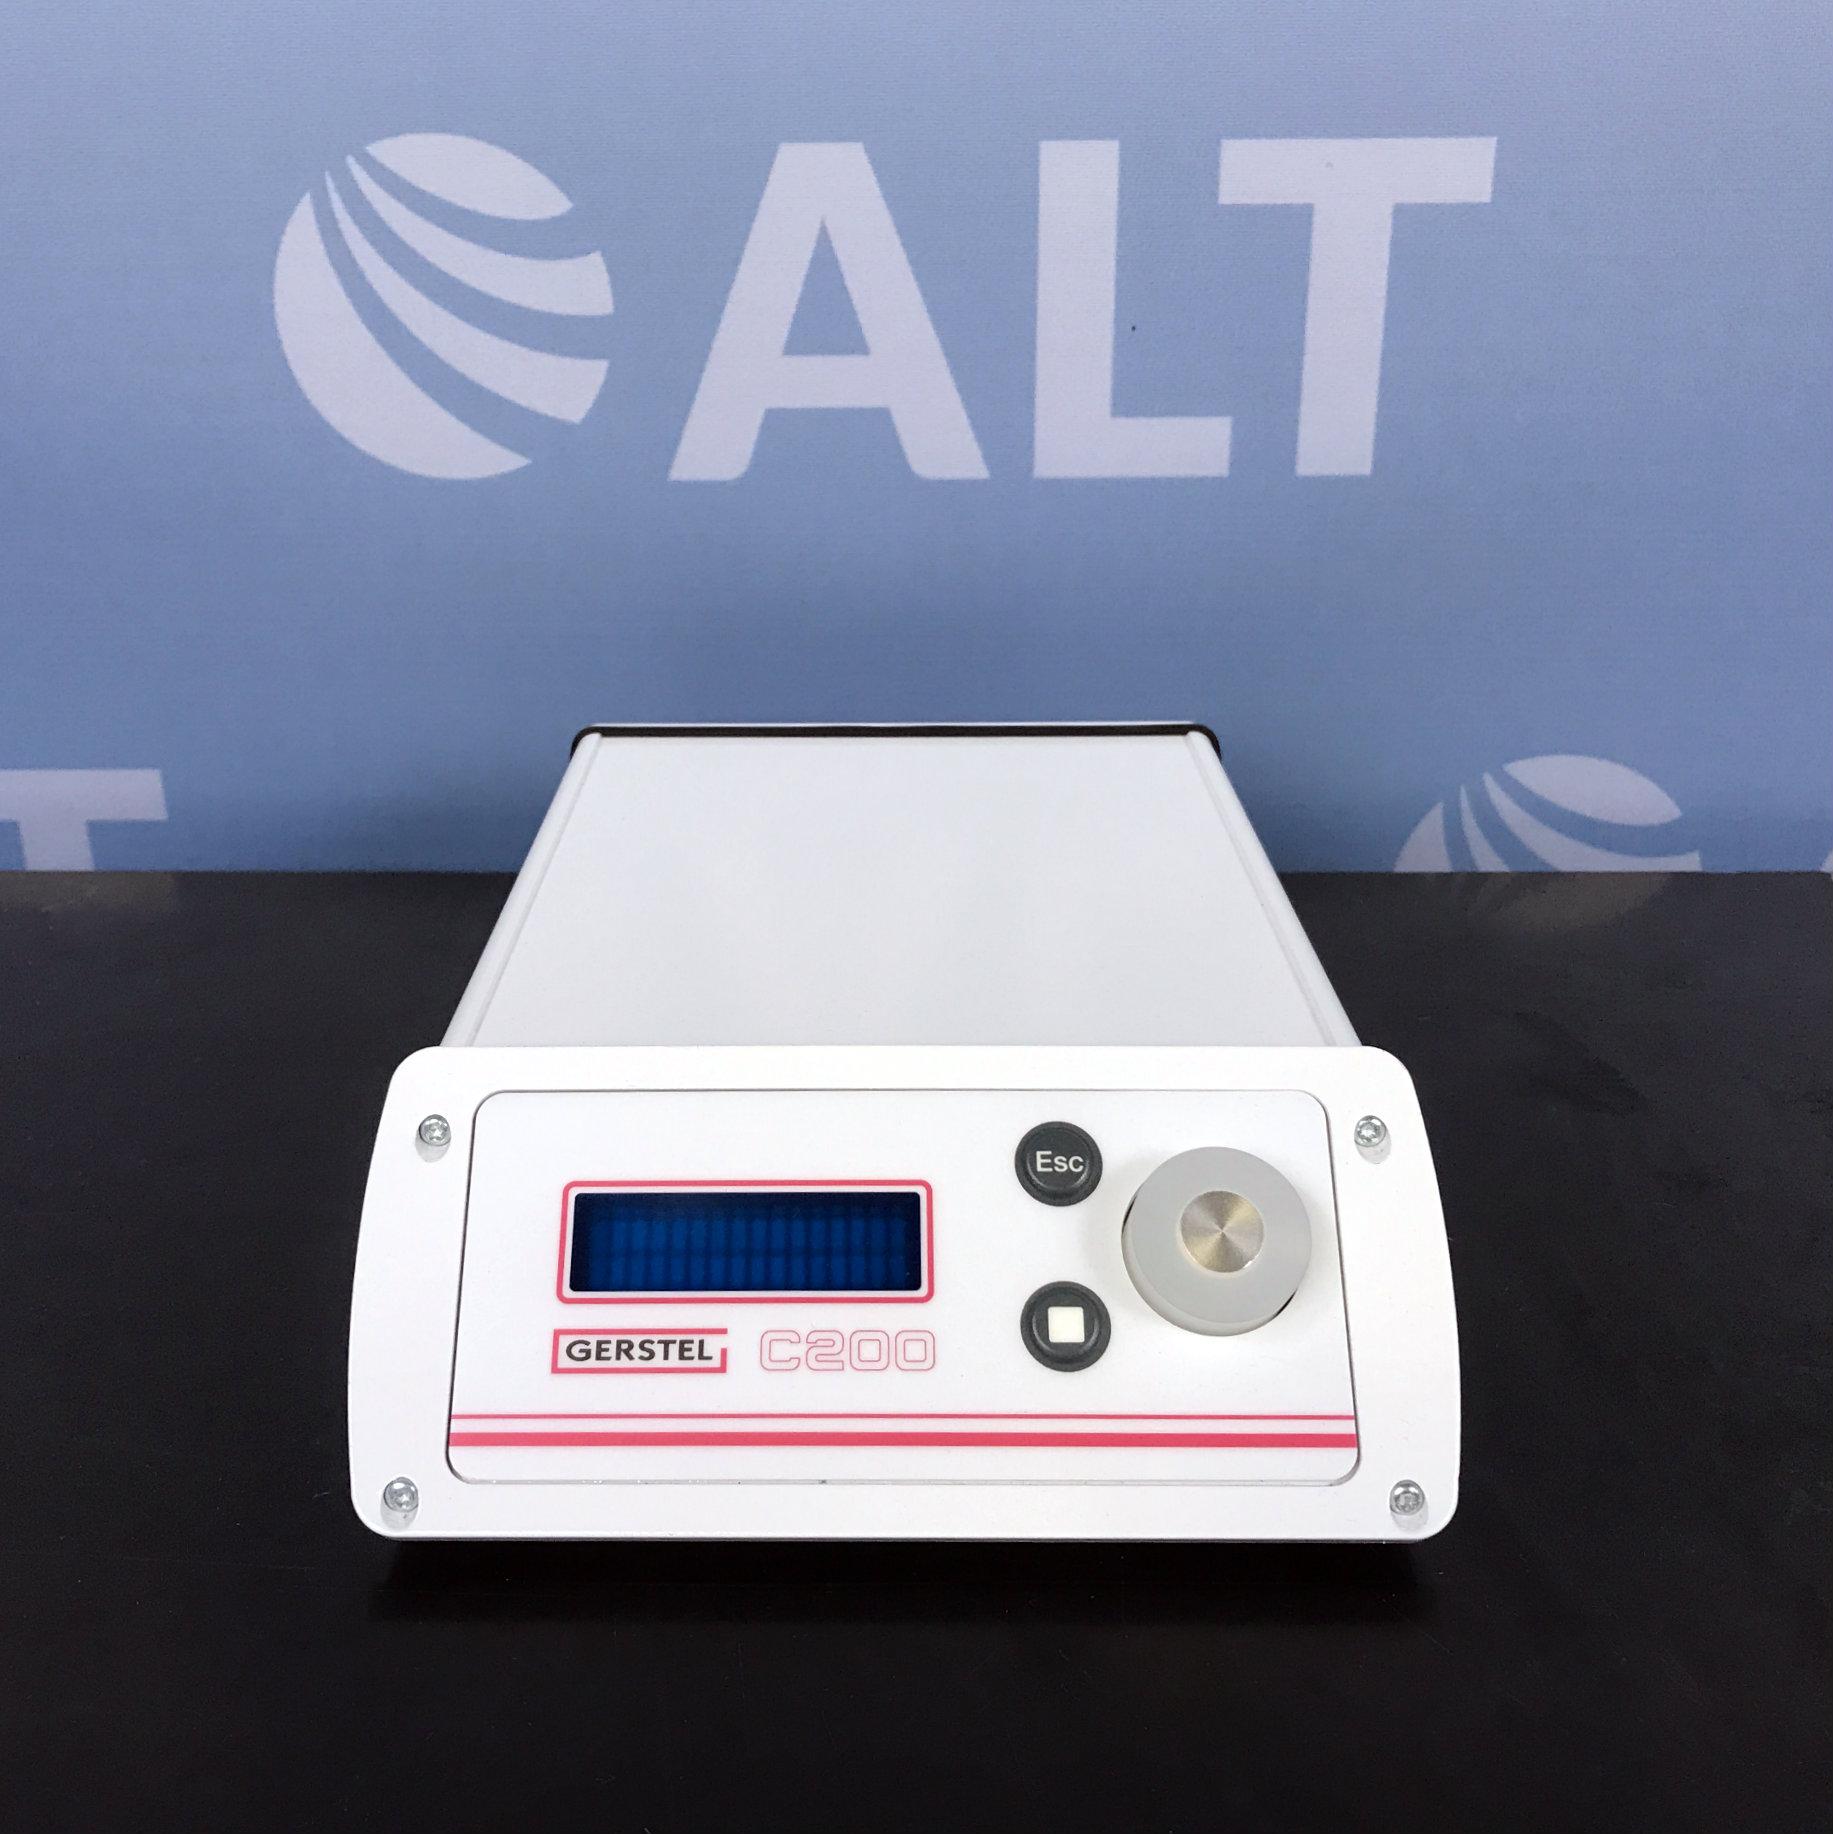 Gerstel C200 Controller Image